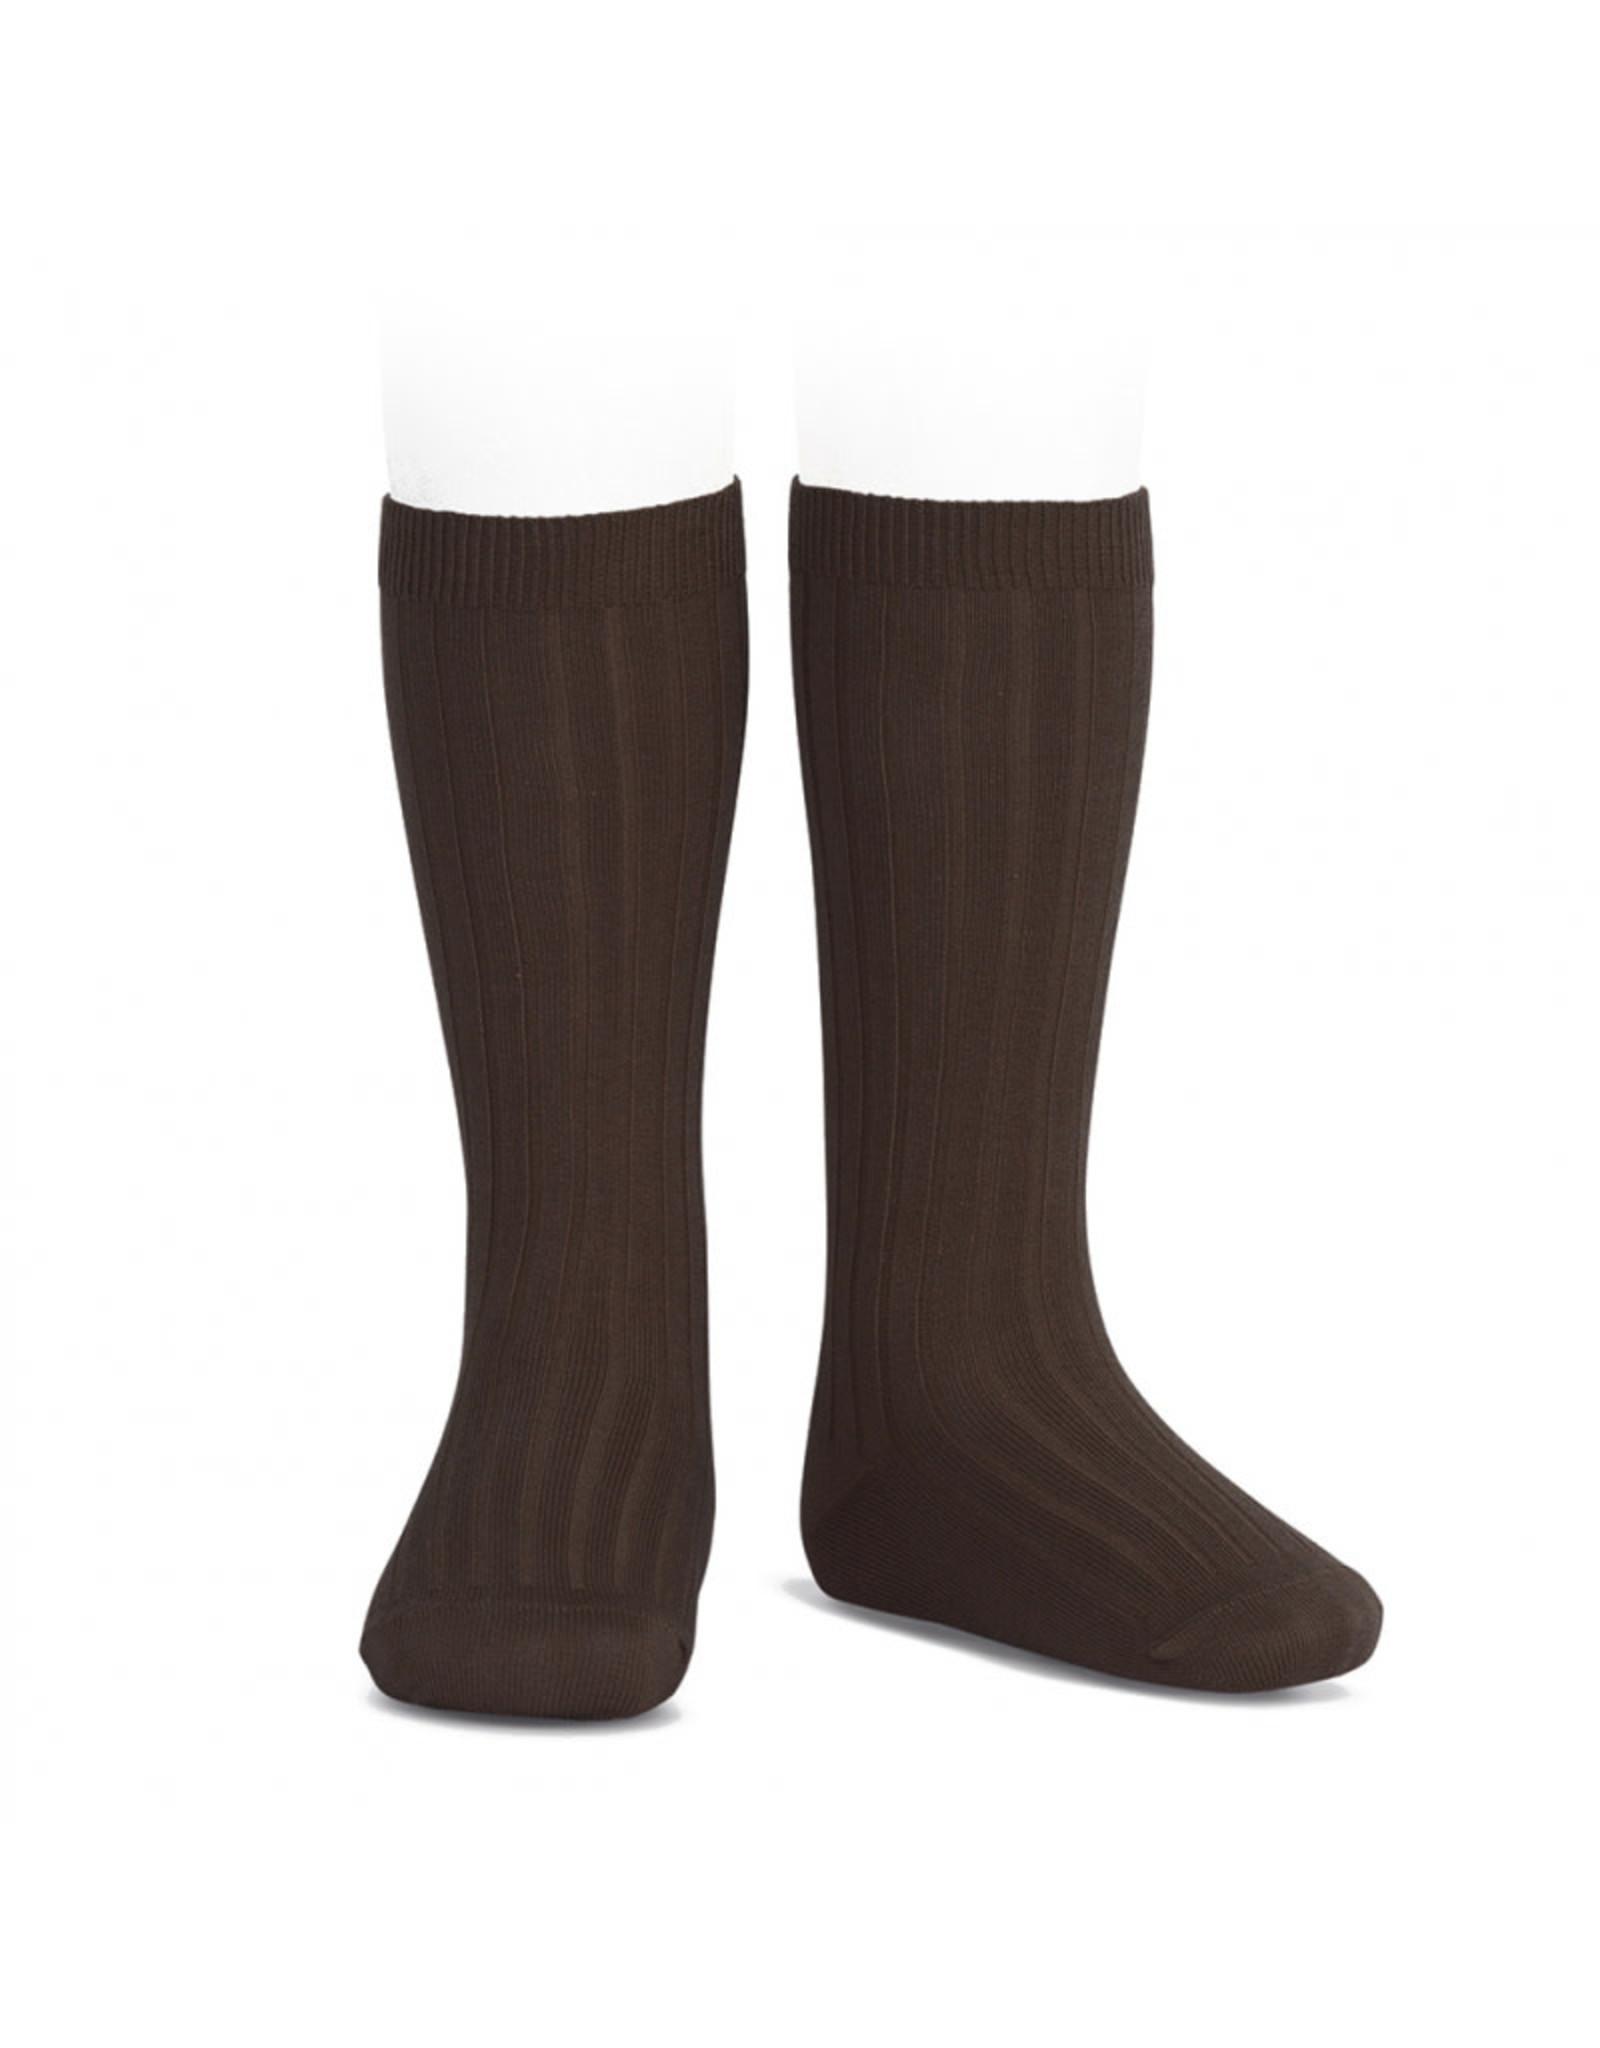 CONDOR Brown Ribbed Knee Socks